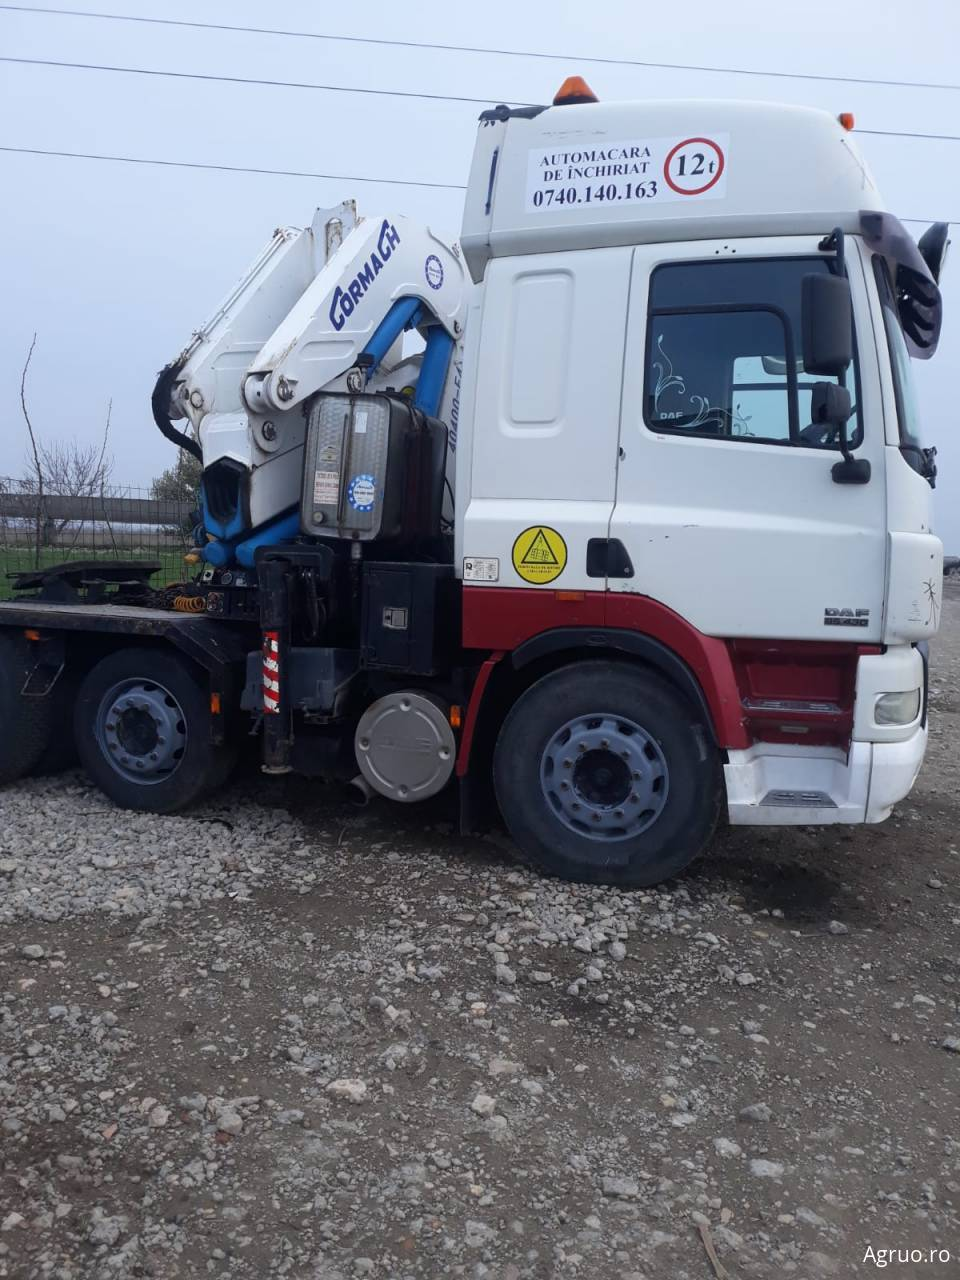 Camion cu automacara51153